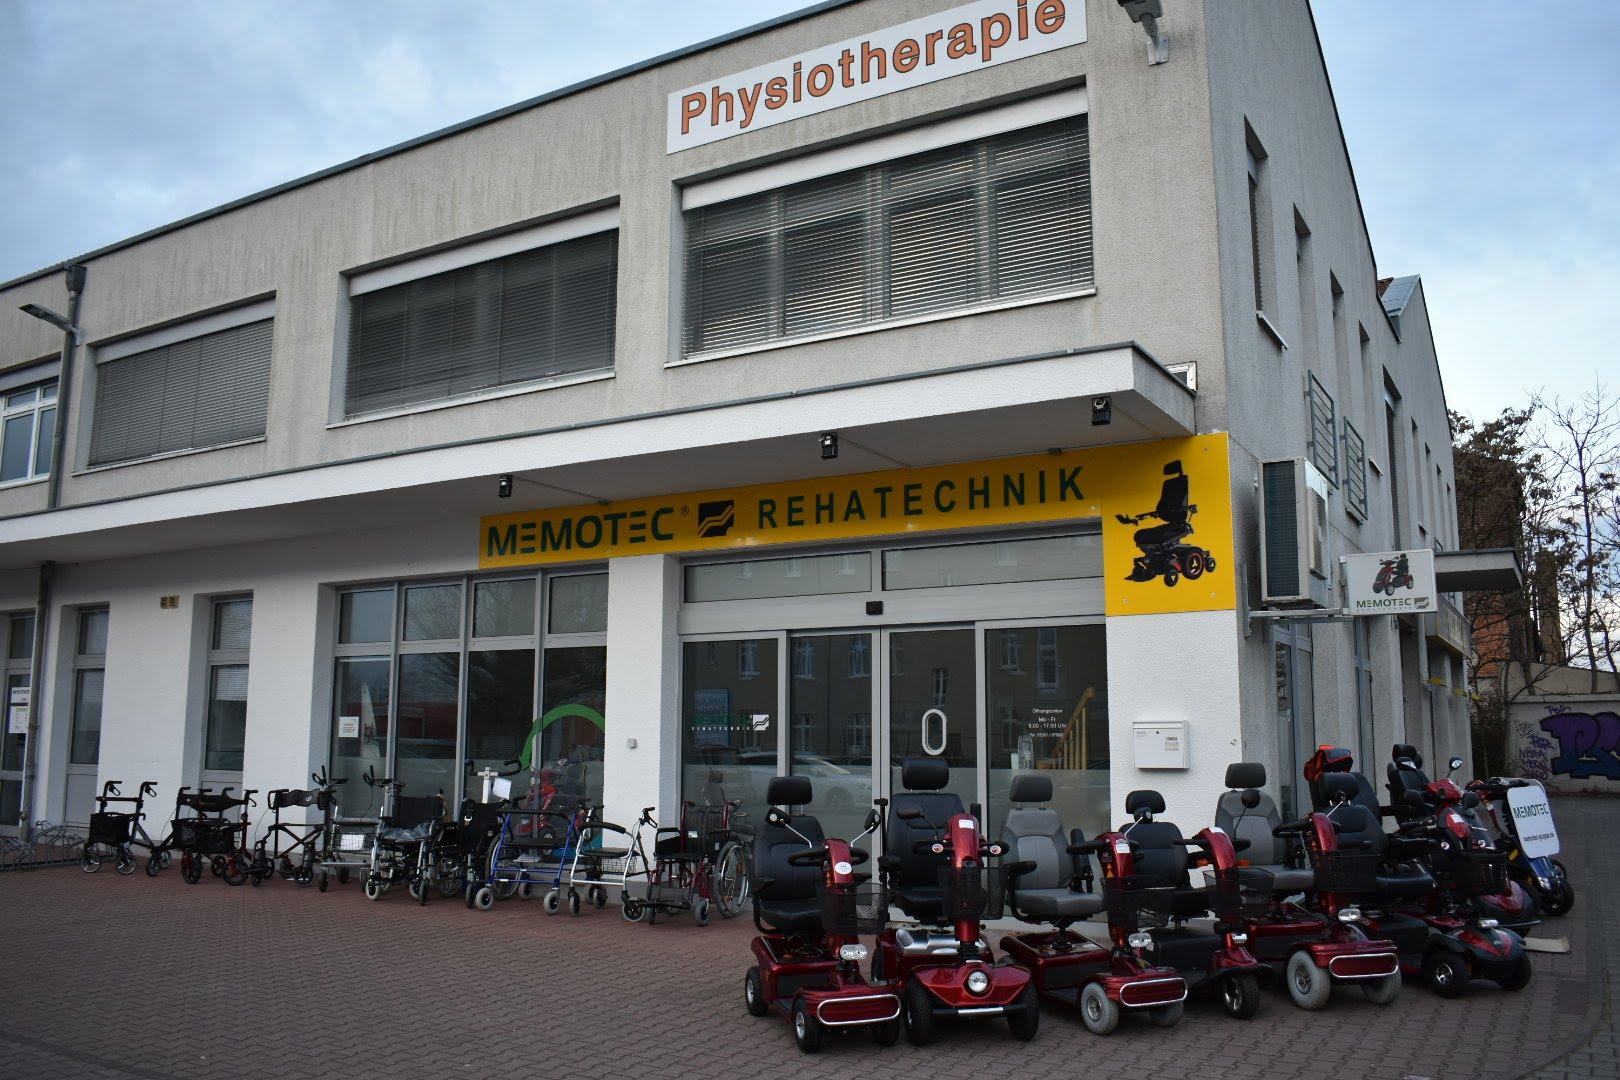 Foto de Memotec Rehatechnik - Sanitätshaus Oranienburg & Hilfsmittelverleih